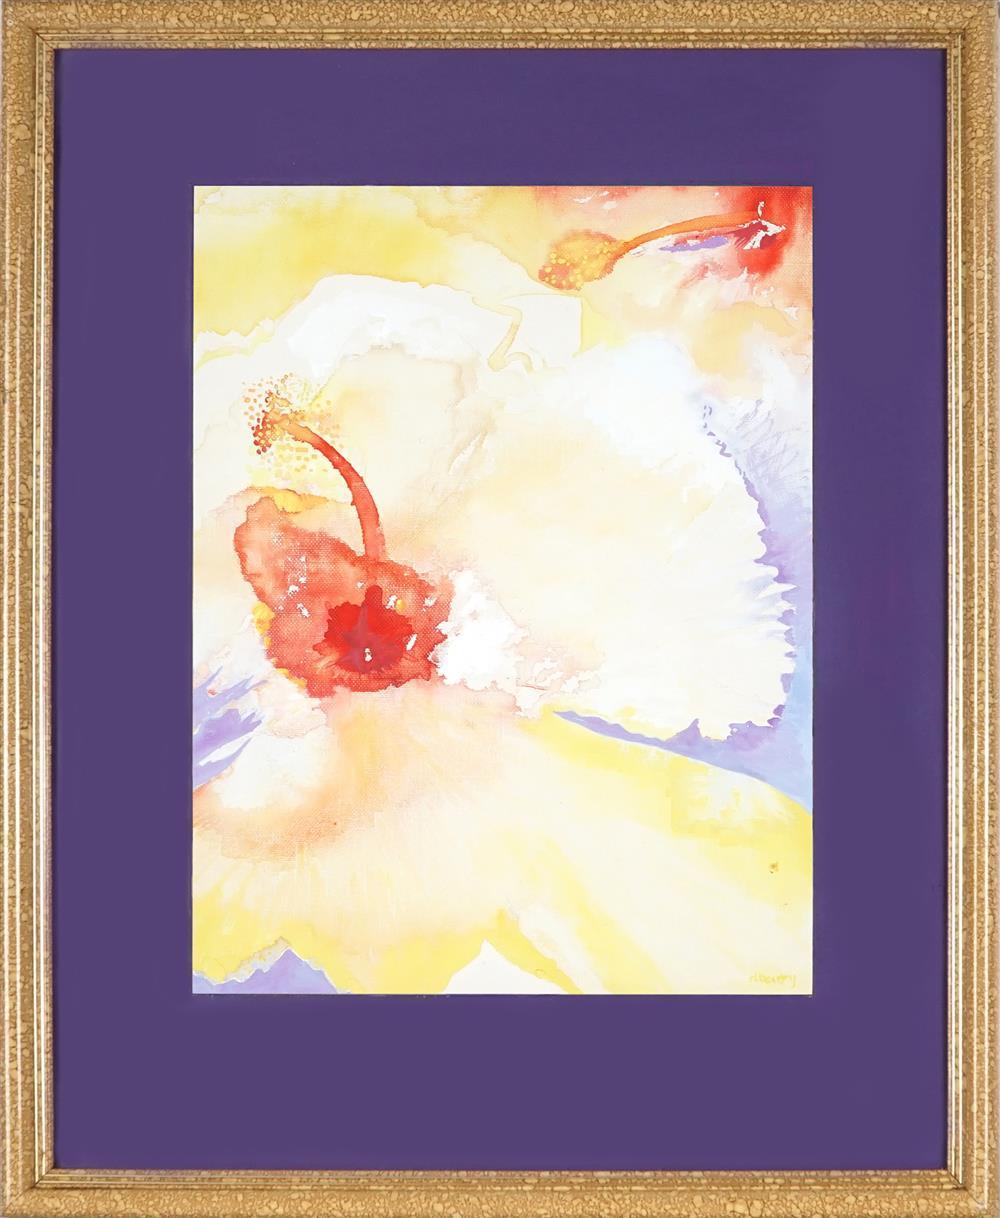 Denise Barry - Hibiscus I 39 x 28.5cm